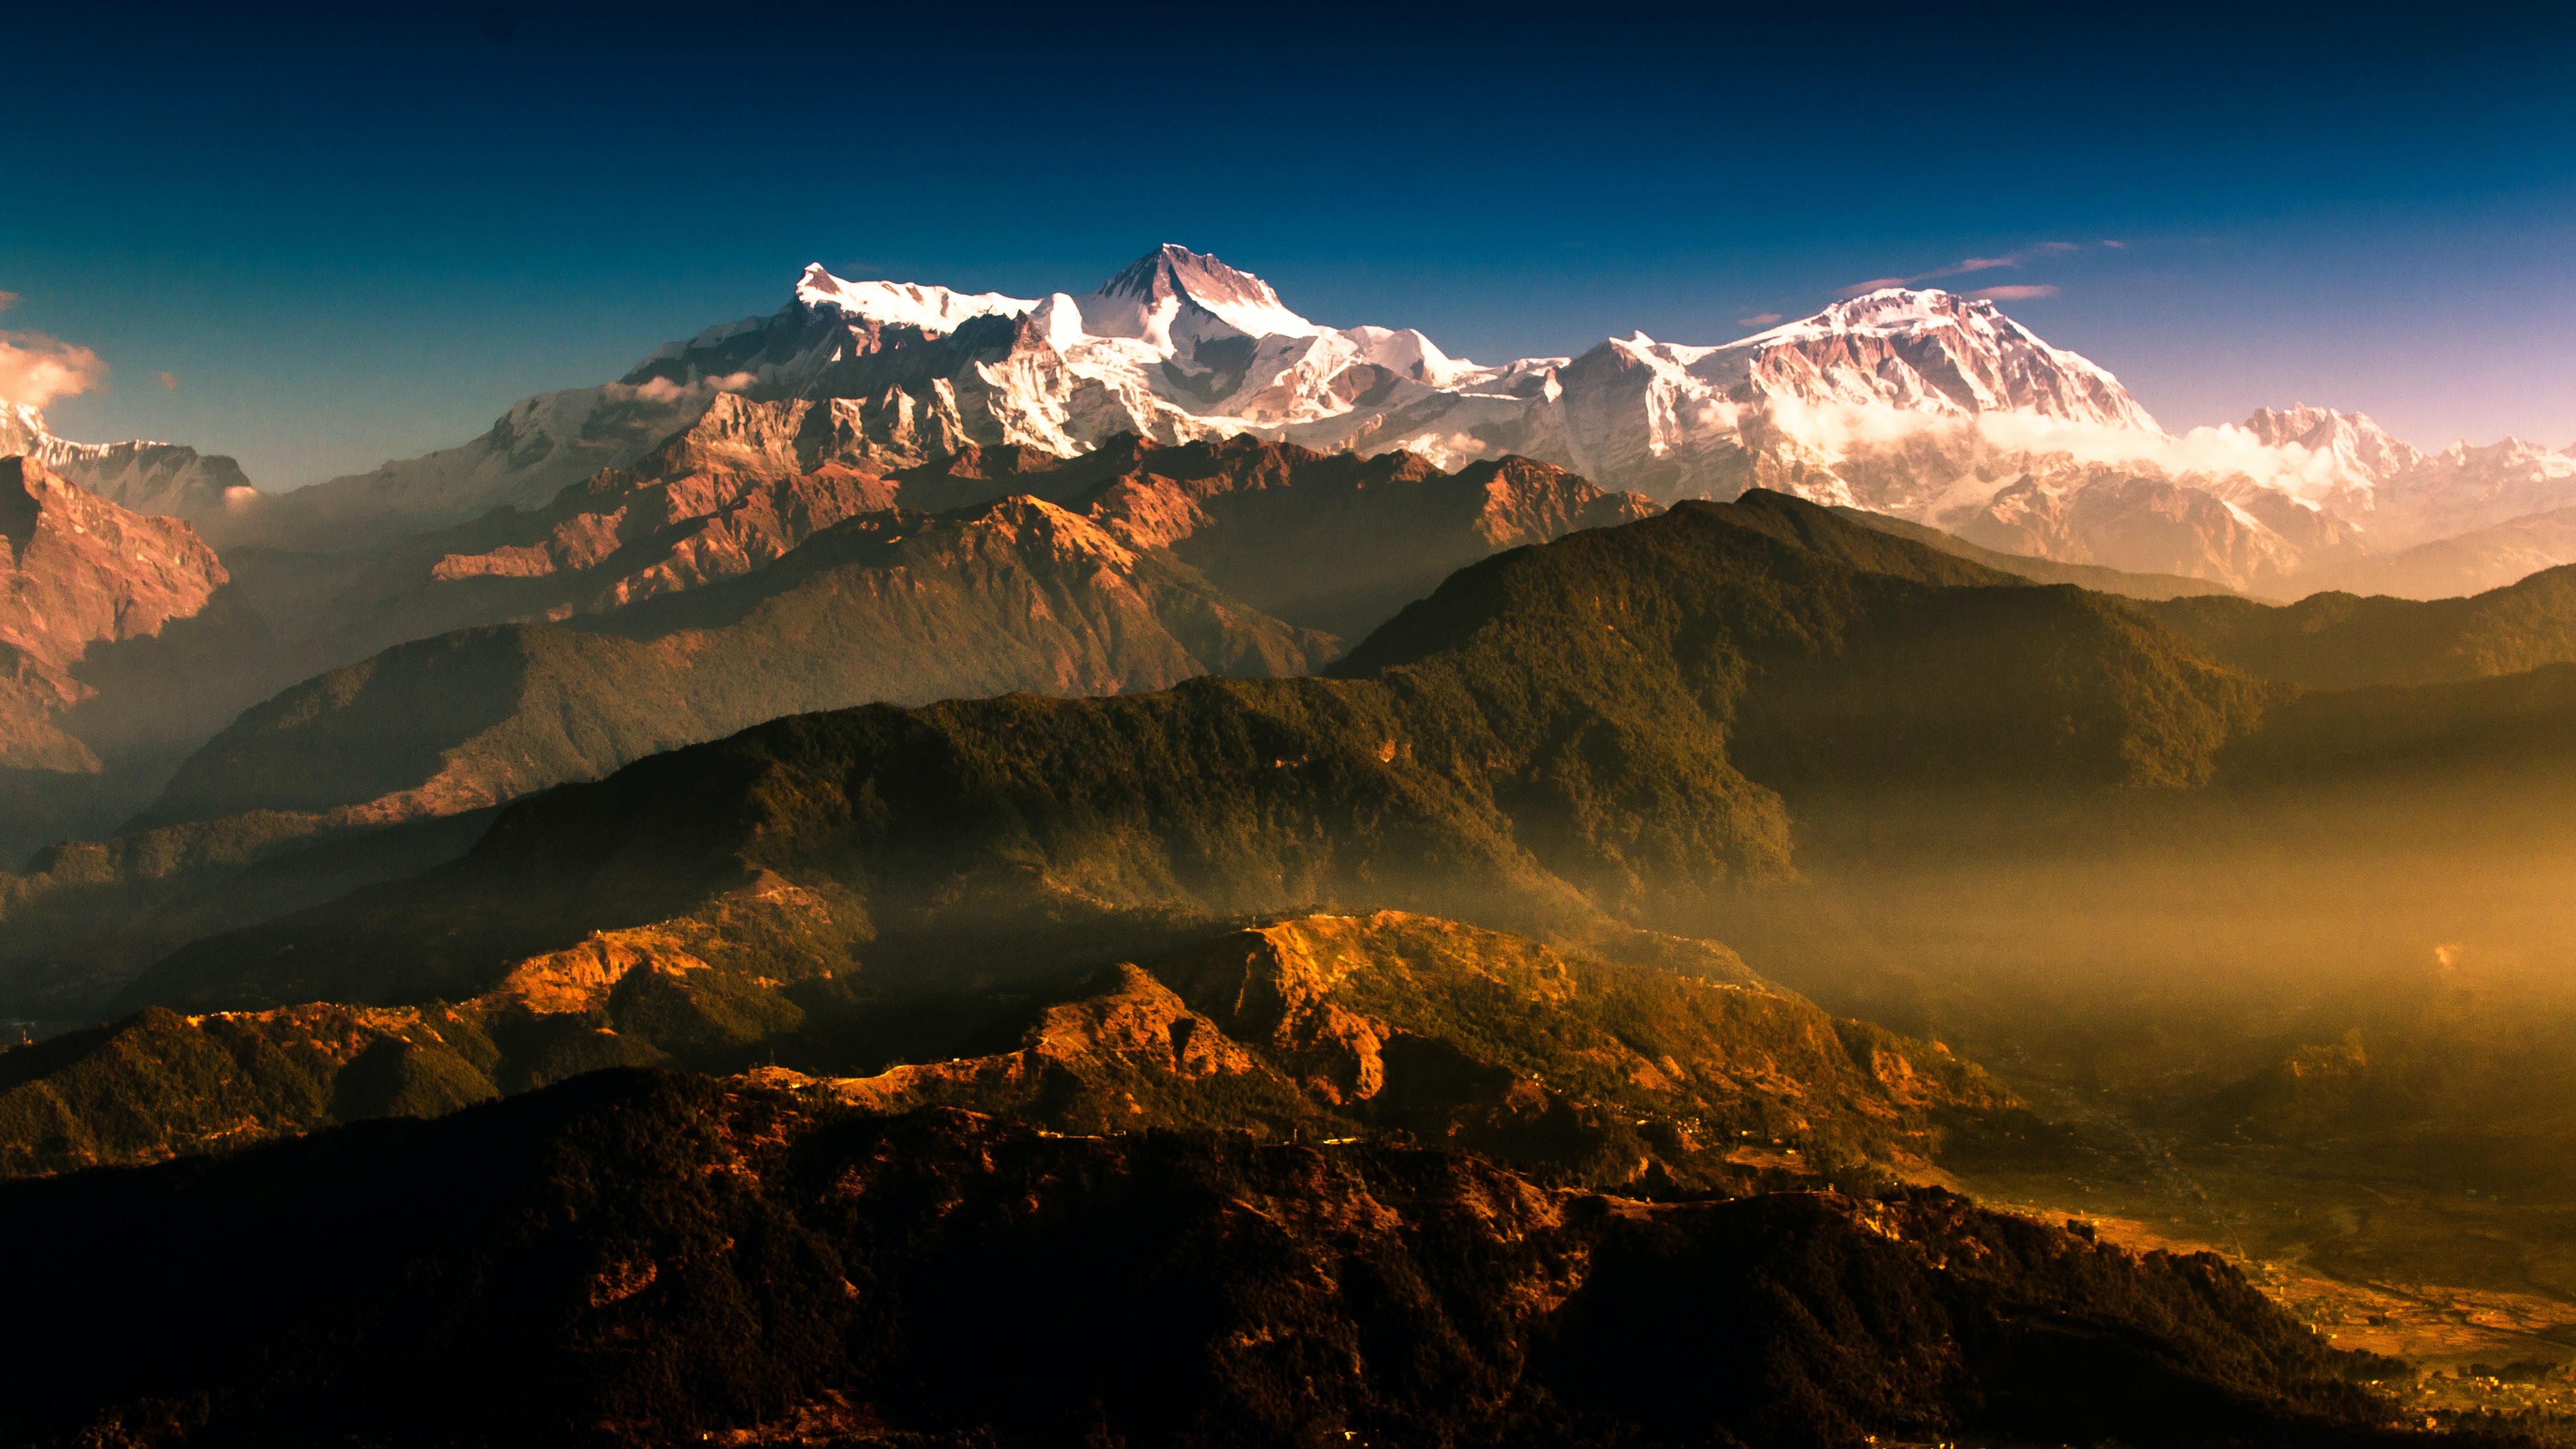 wide angle photo of mountain terrain